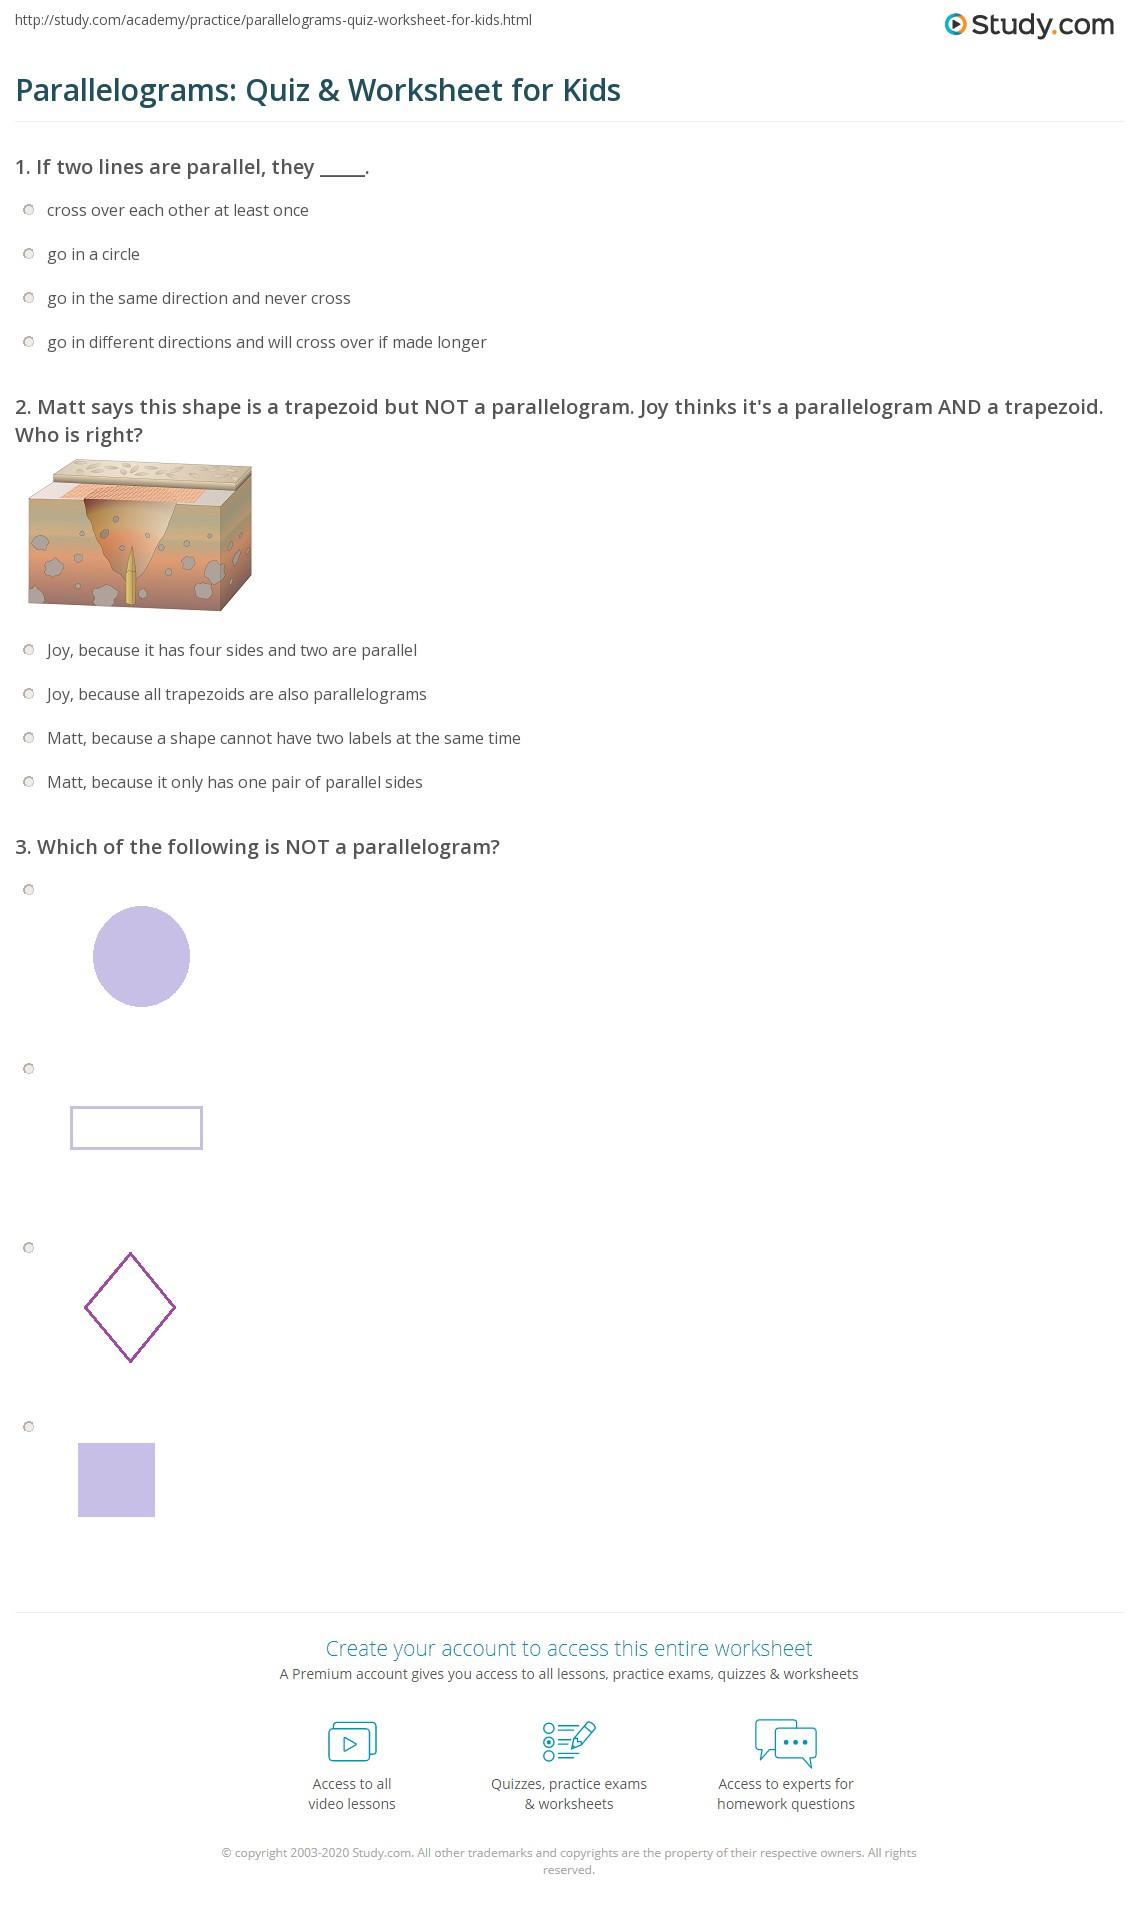 worksheet Trapezoid Worksheet parallelograms quiz worksheet for kids study com print parallelogram lesson worksheet